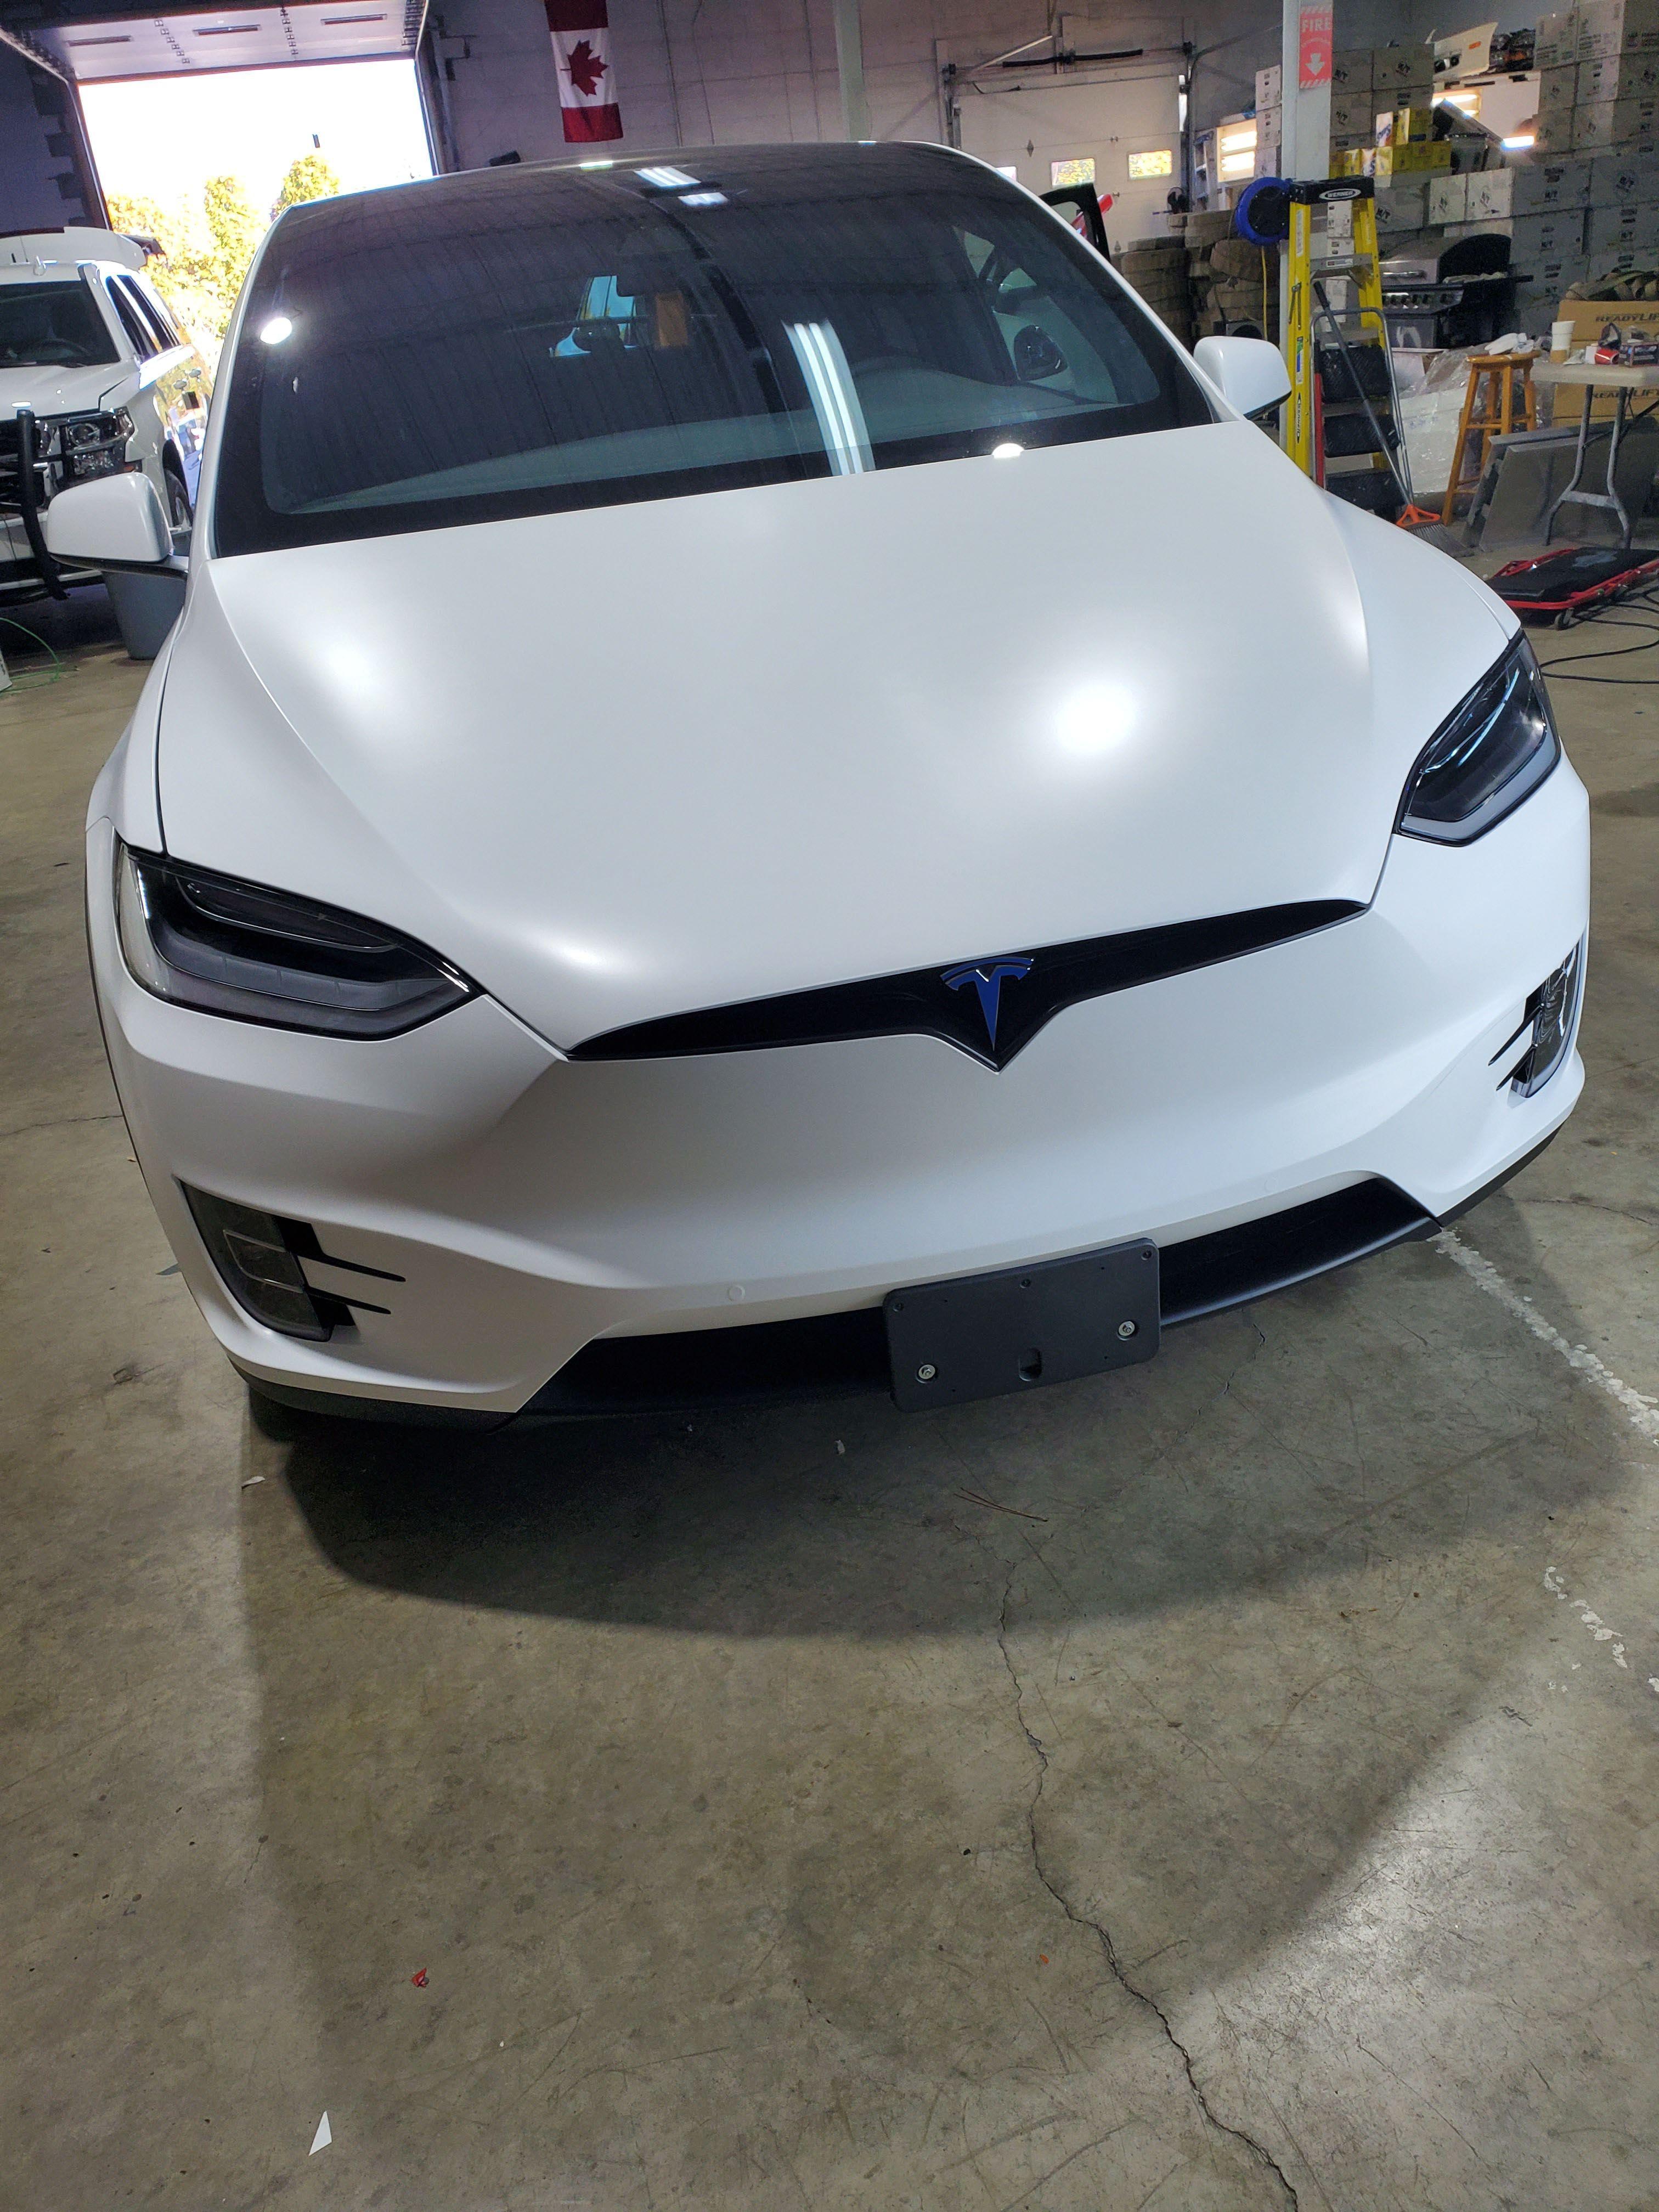 Pin By Mike Sanchez On Tesla Y Tesla Model X Tesla Model Dream Cars Novitec tesla model 3 2019 4k 2